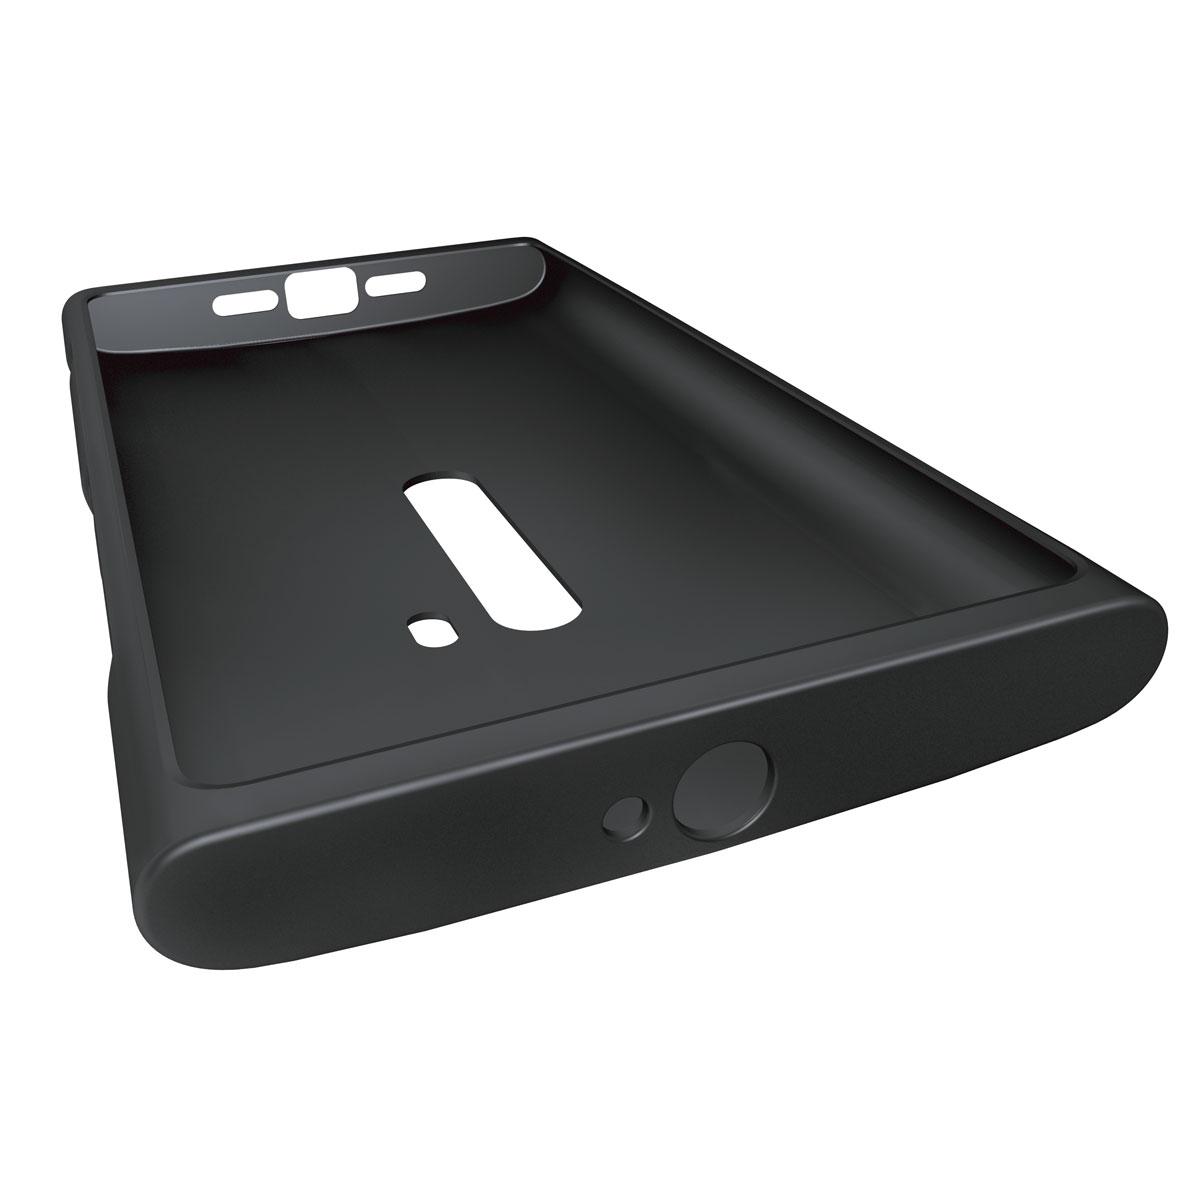 Etui téléphone Nokia CoverTop CC-1043 Noir Nokia Lumia 920 Coque en silicone pour Nokia Lumia 920